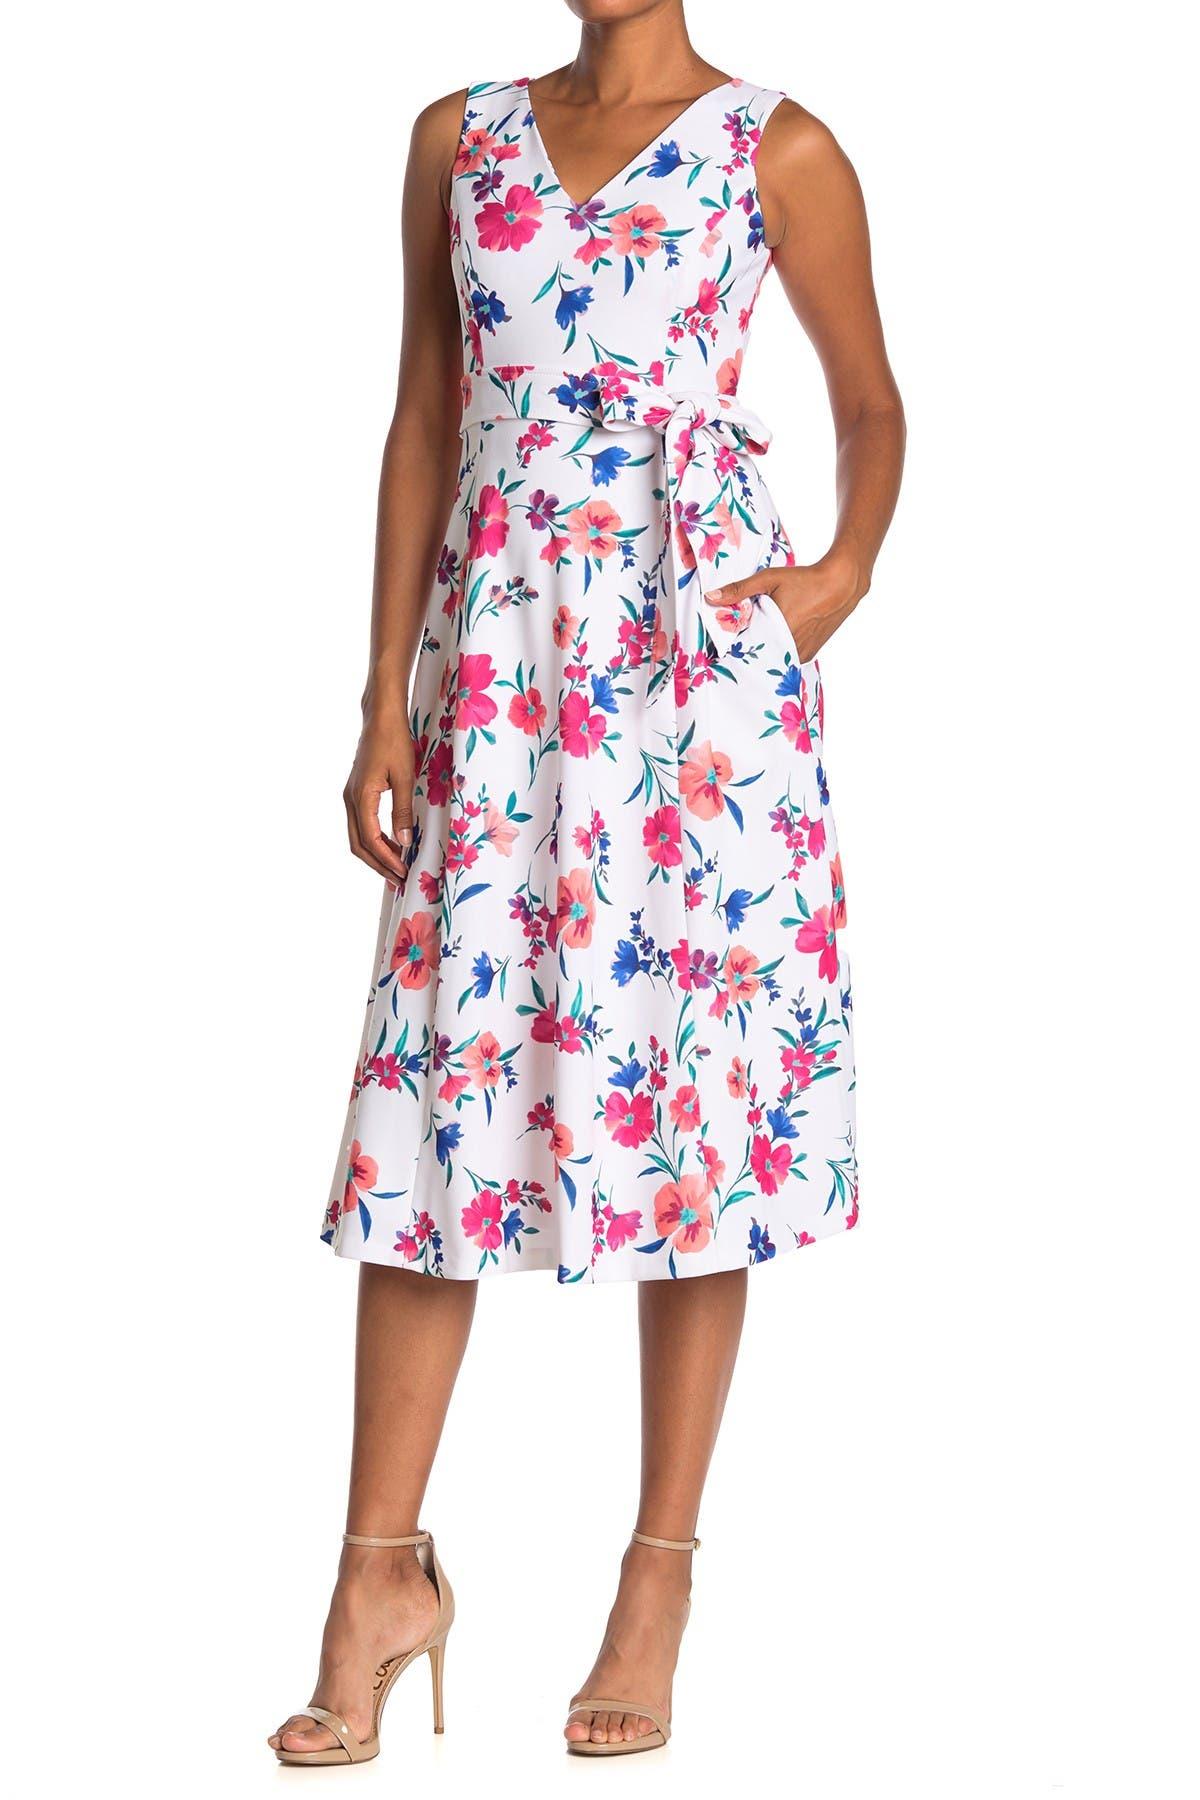 Image of Calvin Klein Floral Tie Waist Midi Dress